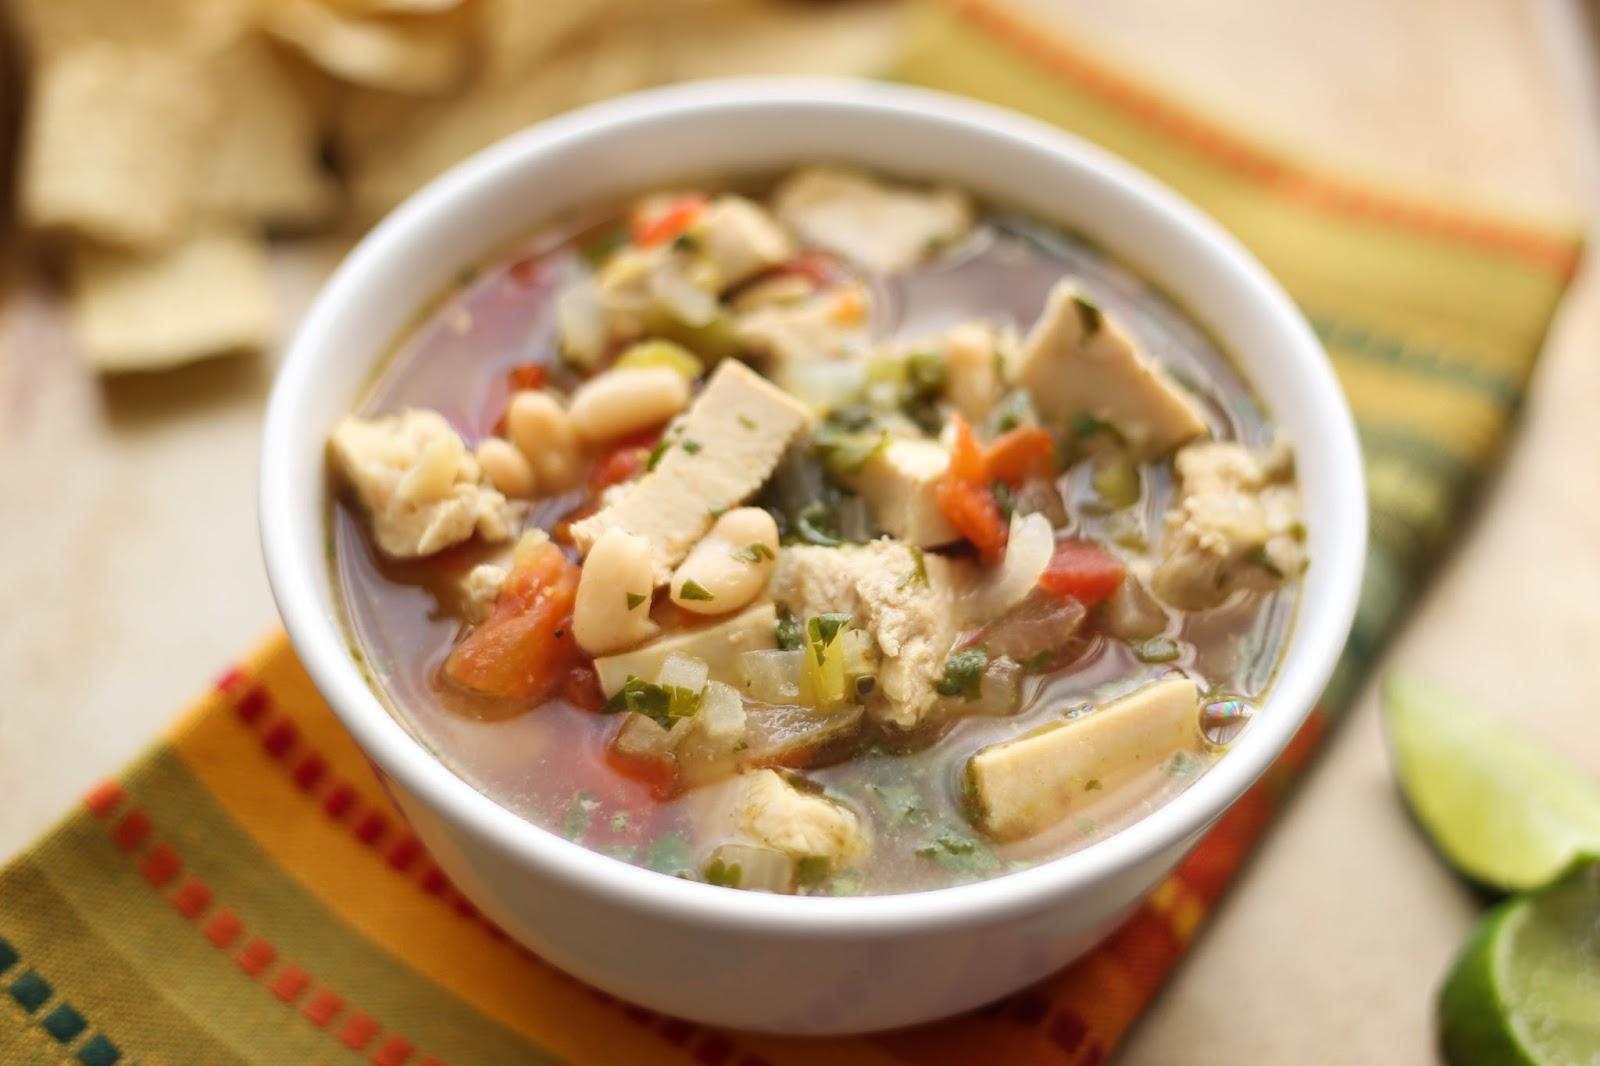 Barefeet In The Kitchen: Chicken Tortilla Soup